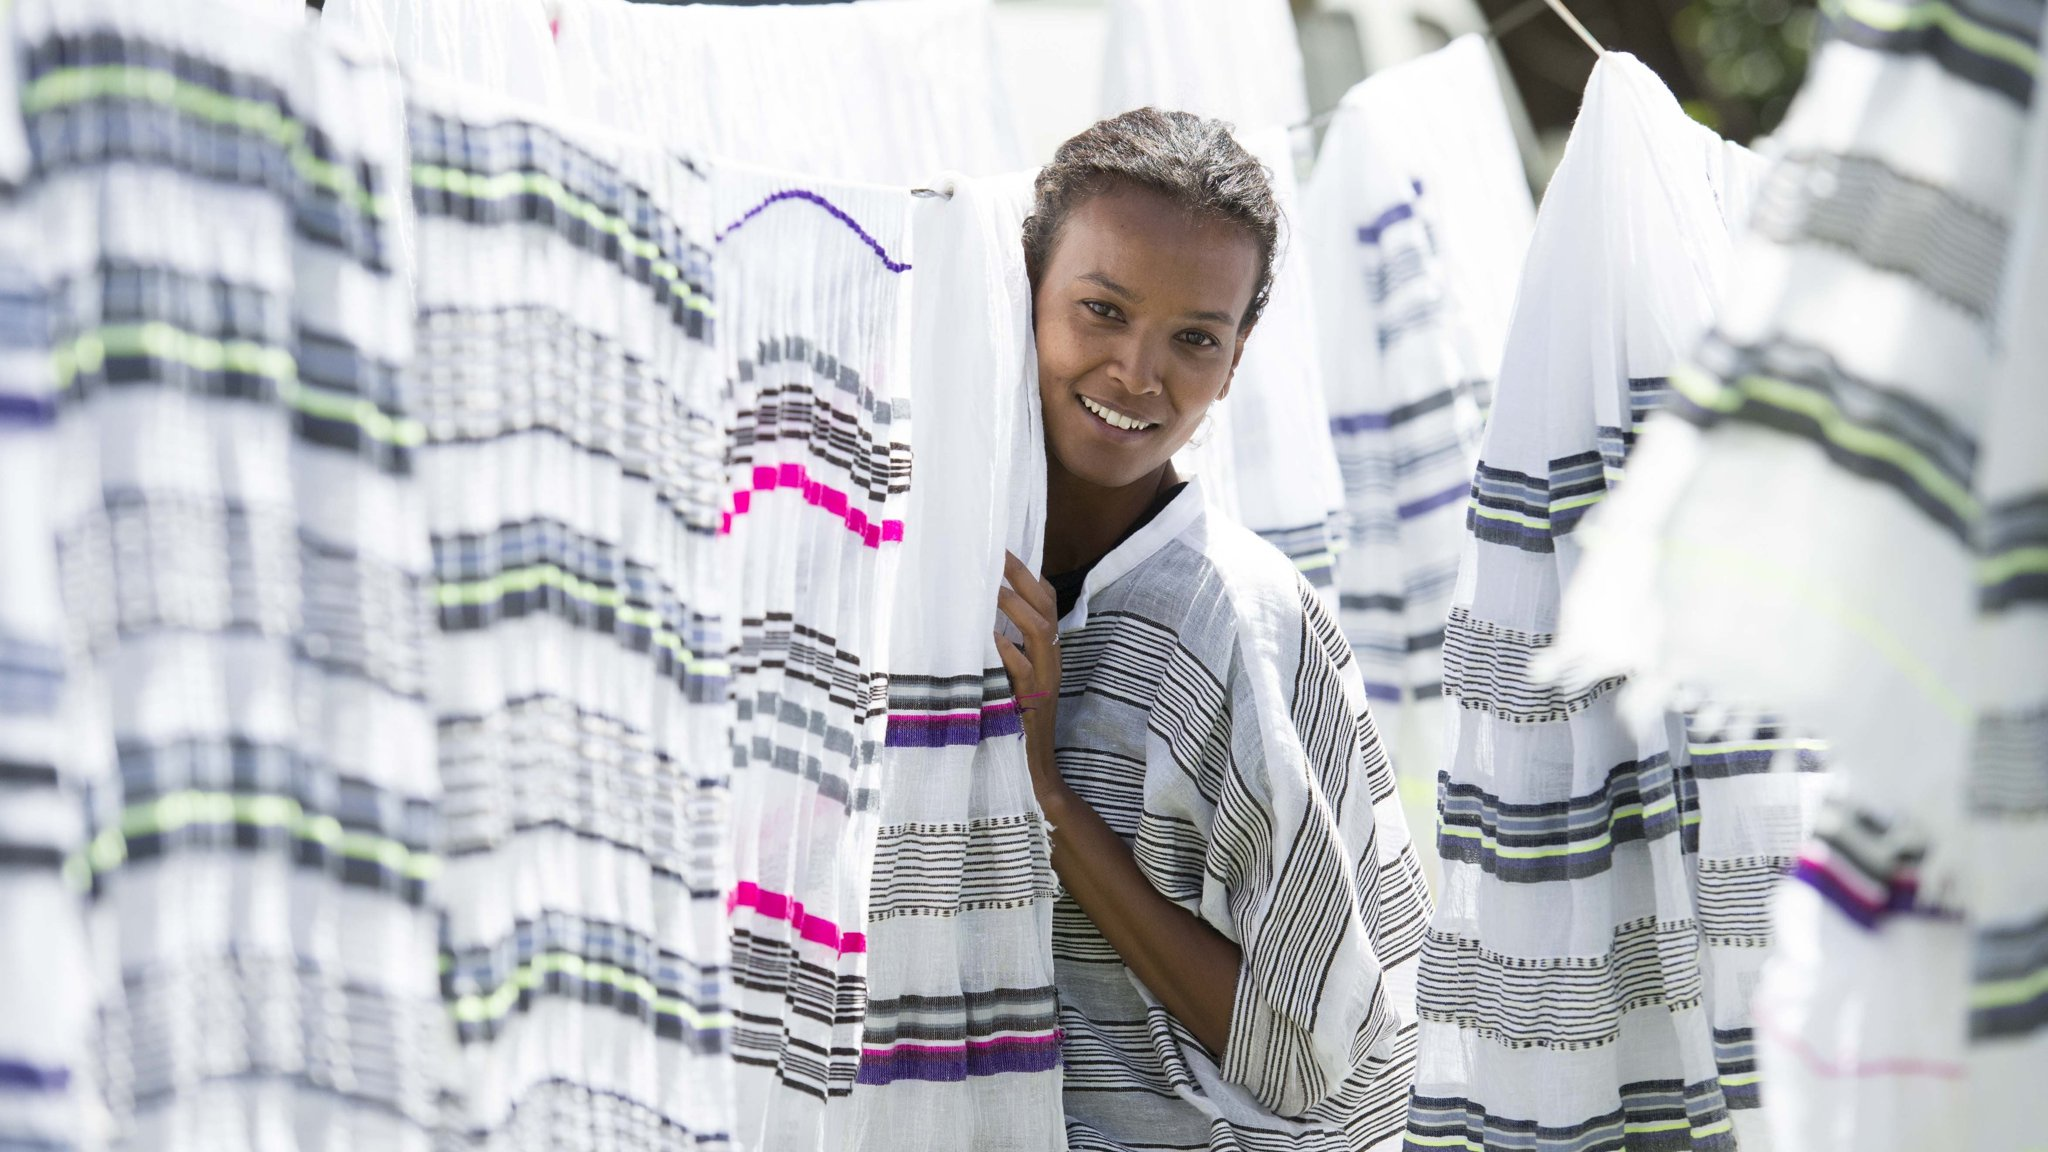 Liya Kebede S Brand Lemlem Offers Ethiopian Craftsmanship That Sells Financial Times